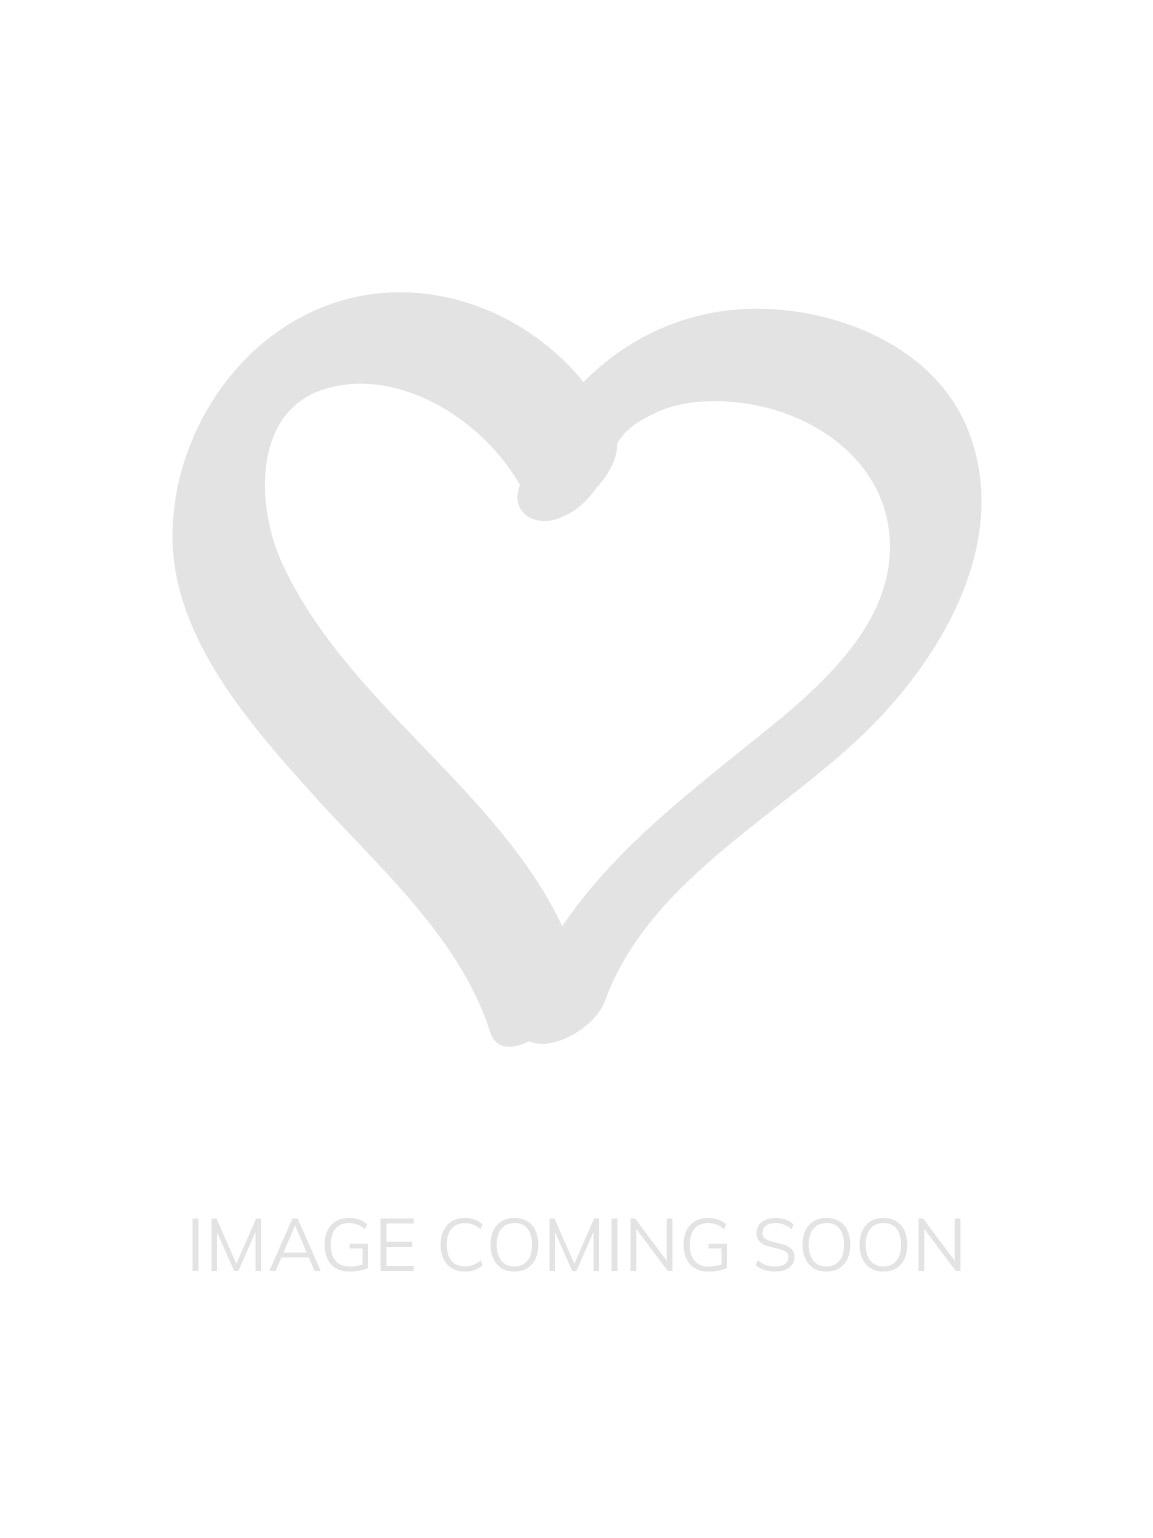 Chantelle Festivite Bra Plunge C36820 Underwired Lace Lightly Padded Lingerie